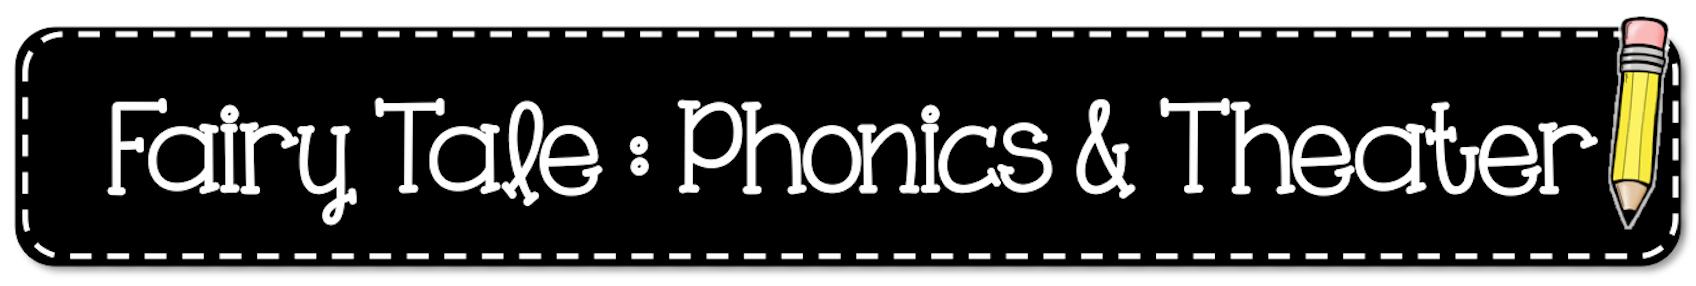 Header Literacy Fairy Tale Phonics Theatre